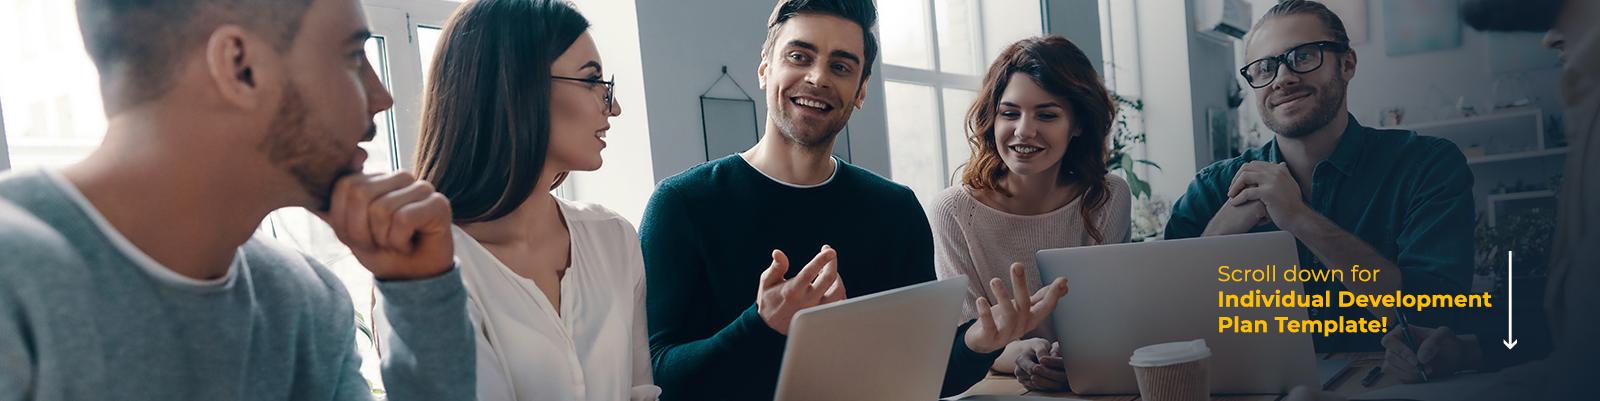 all about employee development in an organization